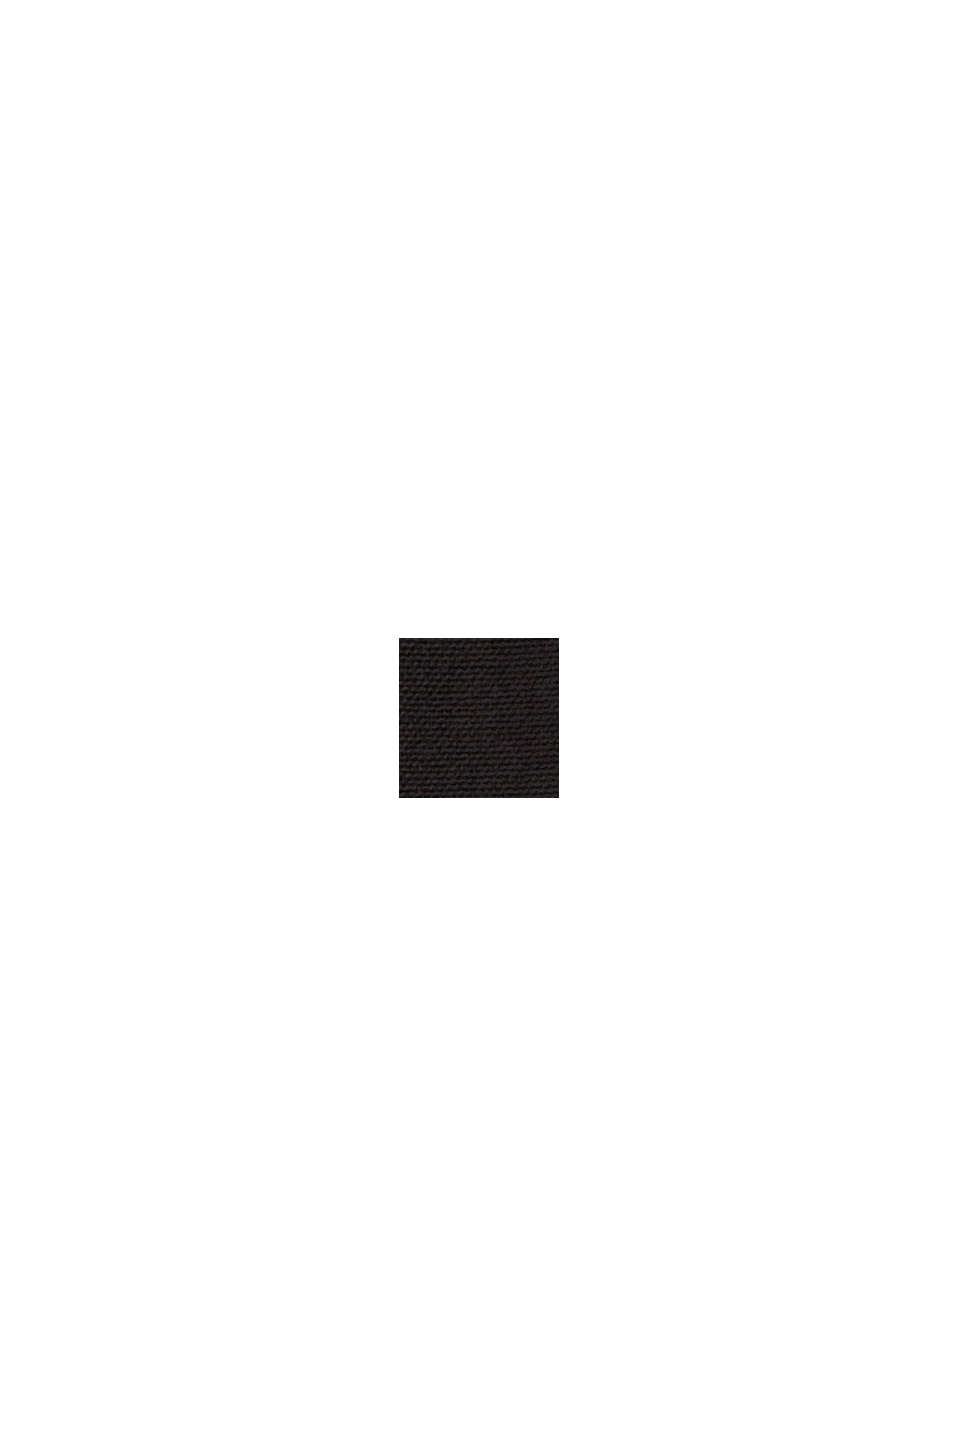 PURE BUSINESS mix + match broek, BLACK, swatch